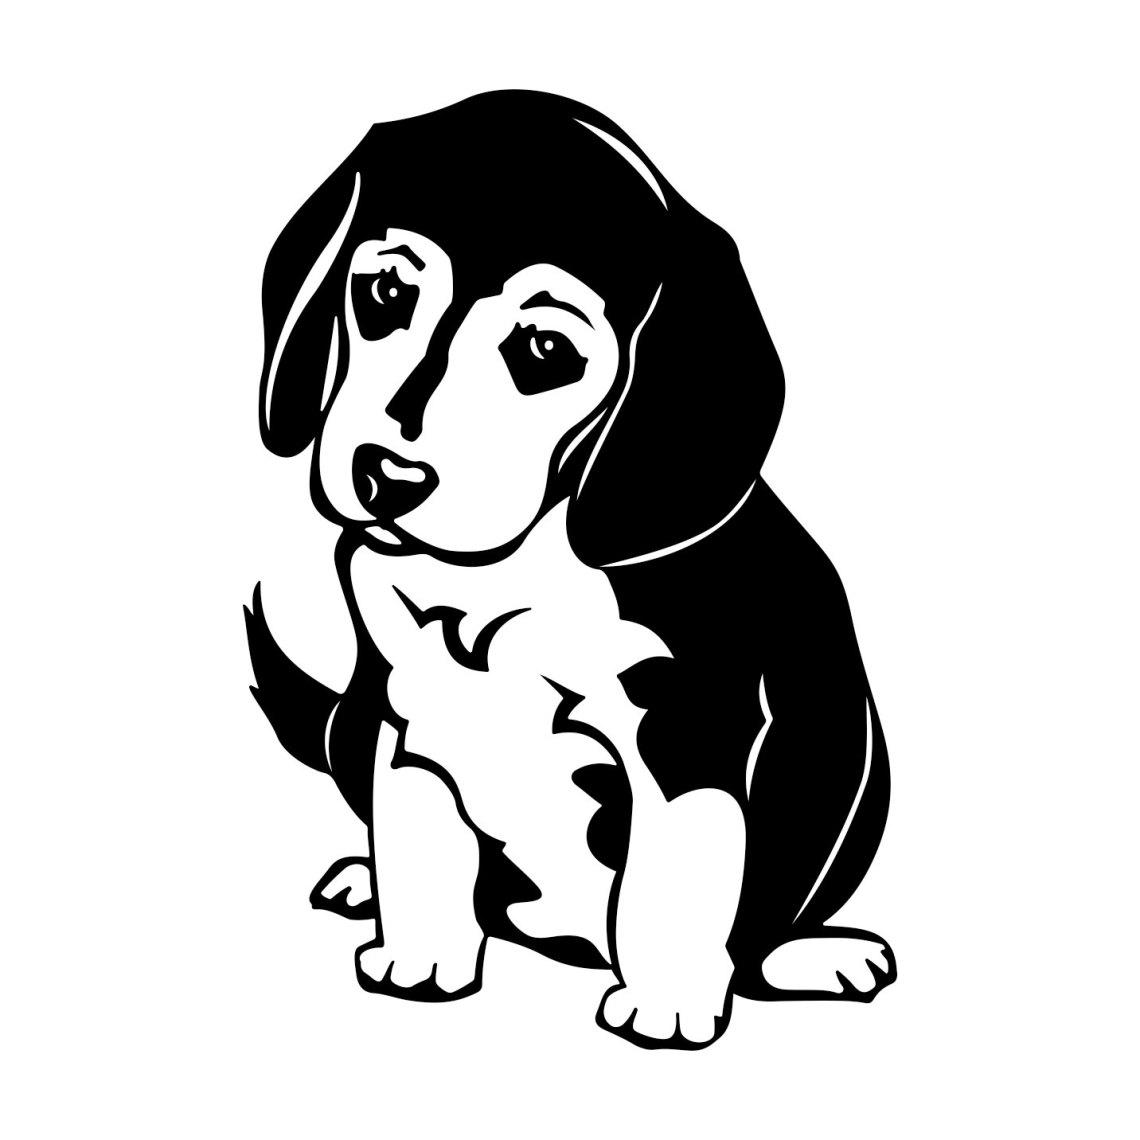 Beagle Dog graphics design SVG, DXF, EPS, by vectordesign ...